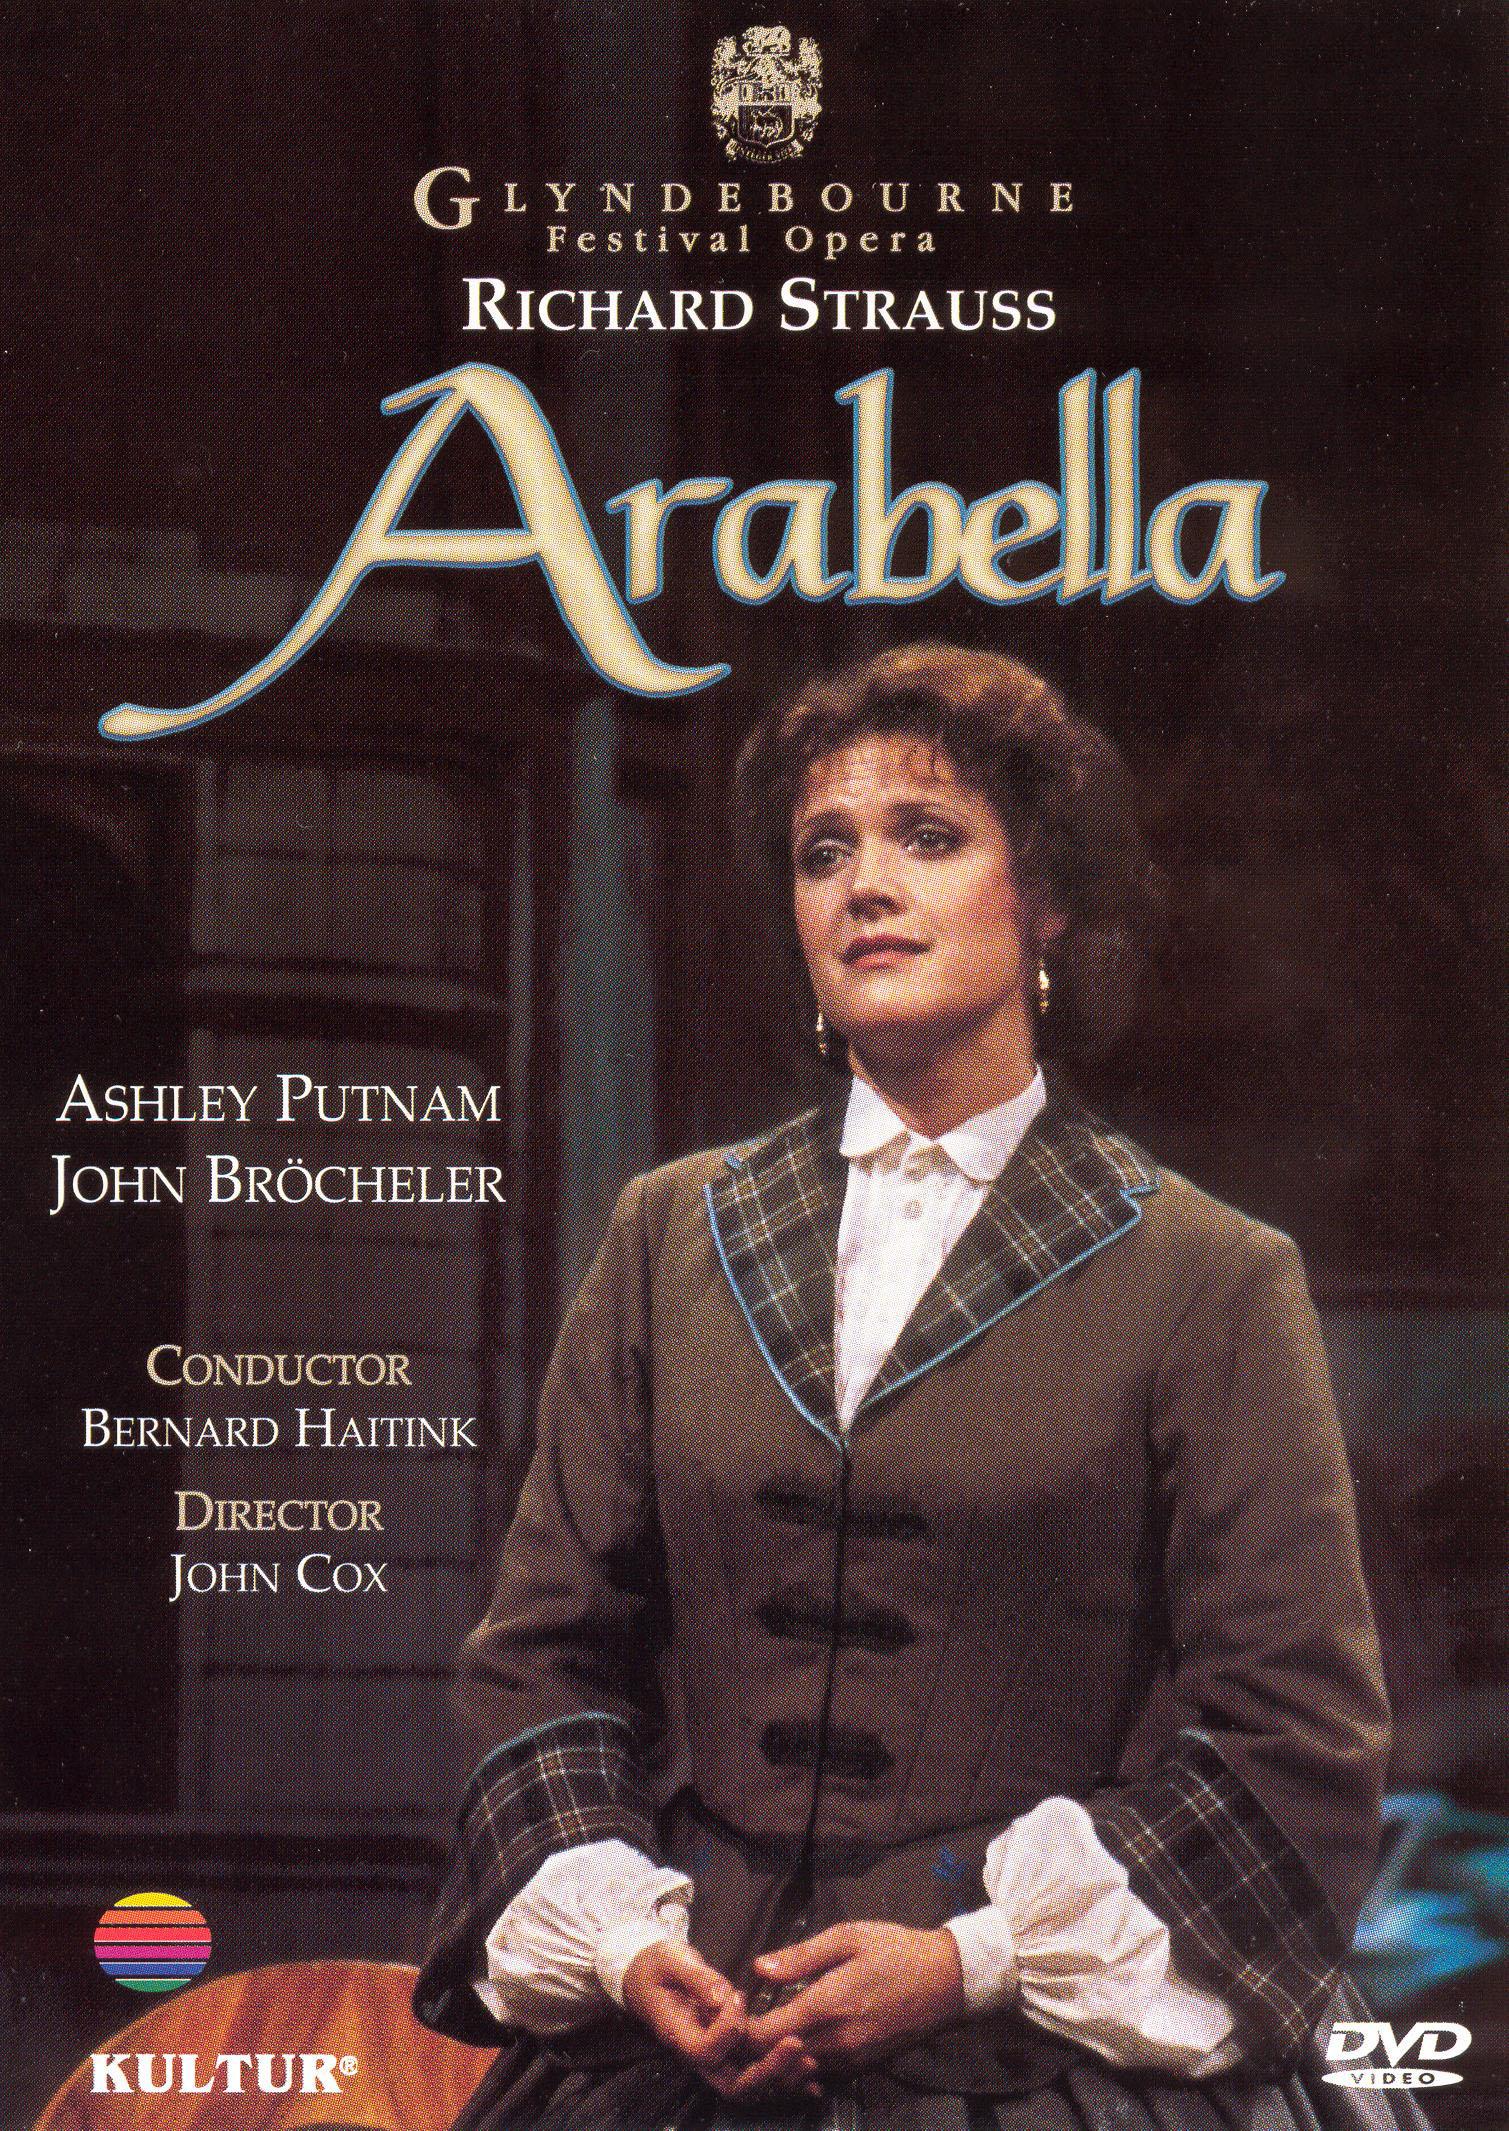 Arabella (Glyndebourne Festival Opera)